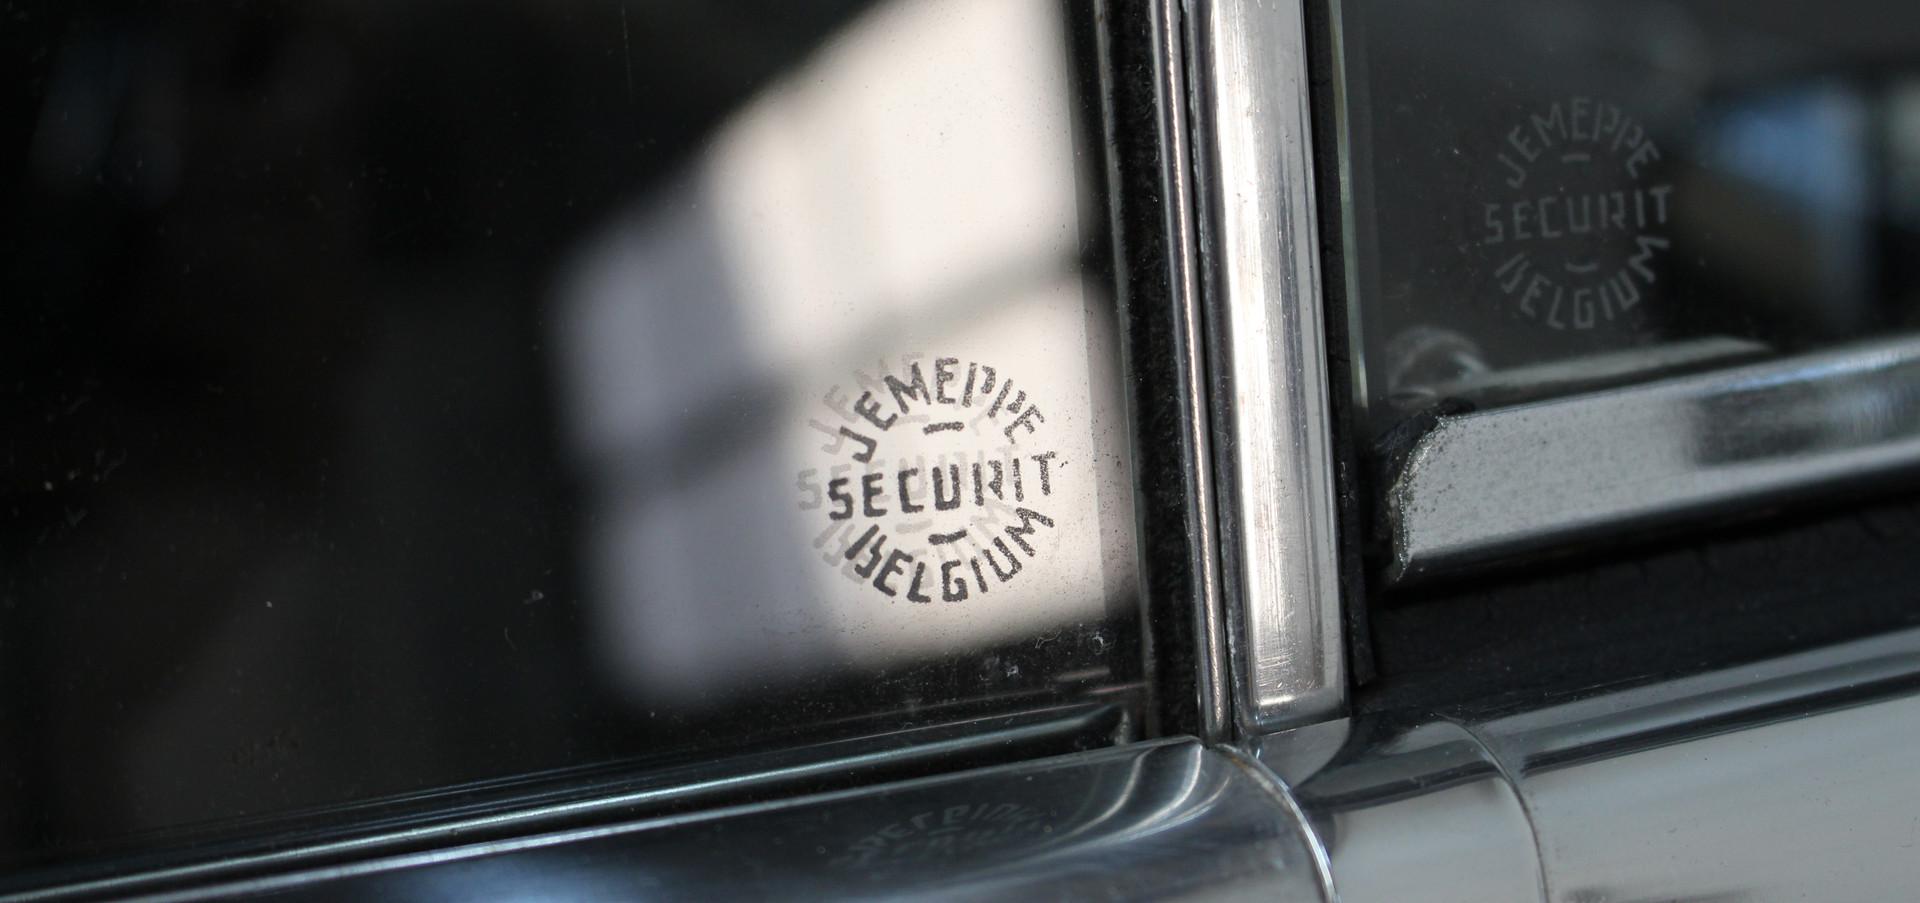 Chevrolet_BelAIr_1953_34.JPG